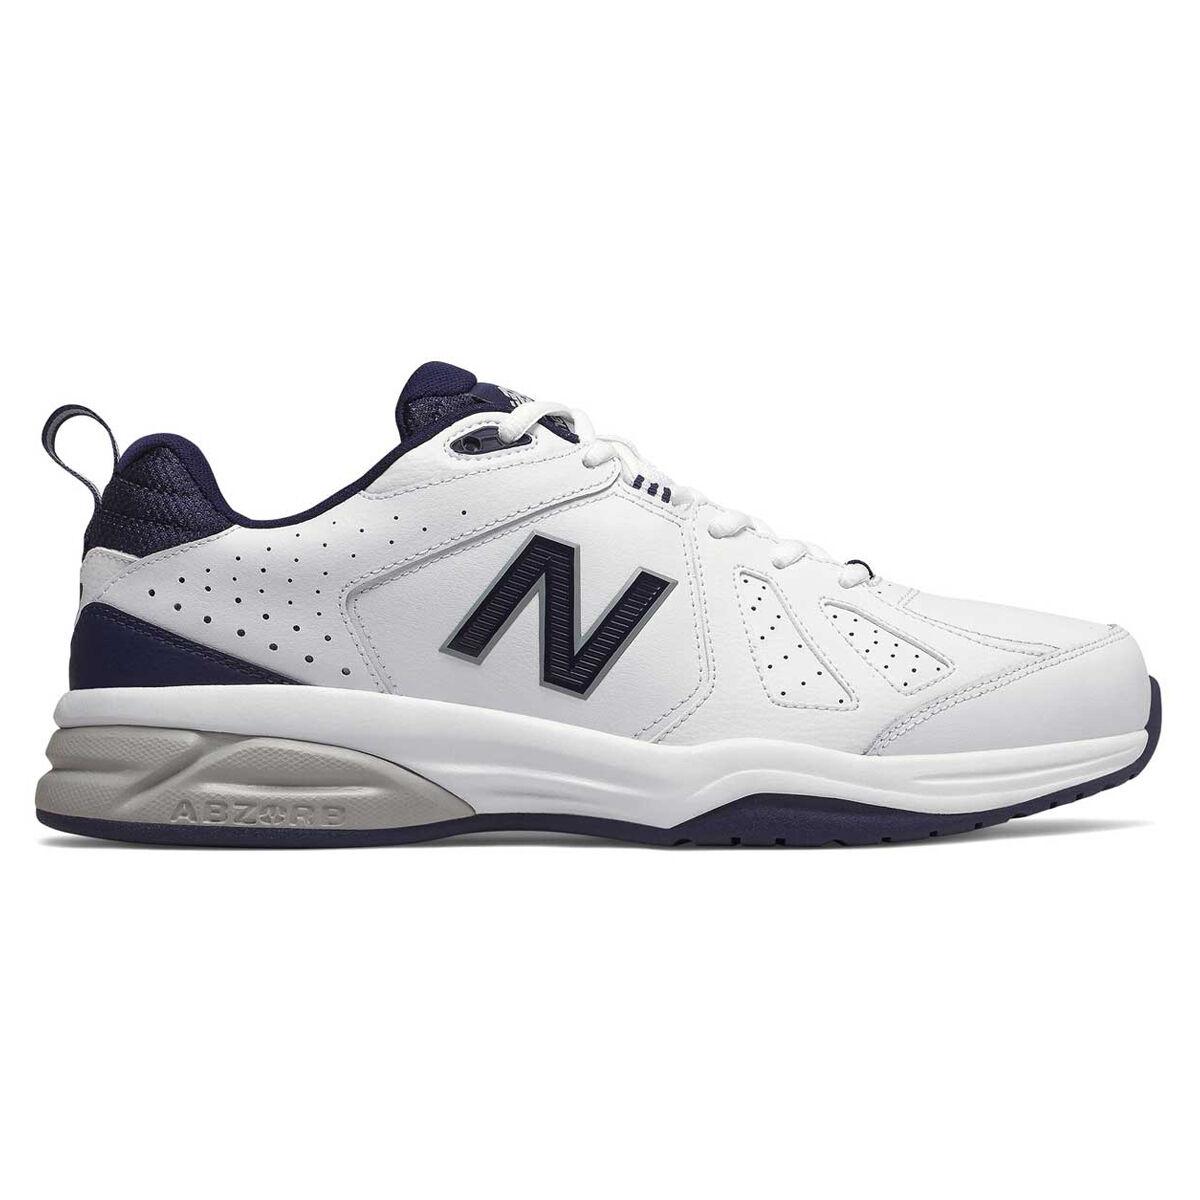 nike shox nabobs women black shoes size 5   New Balance 624 V4 2E Mens Cross Training Shoes